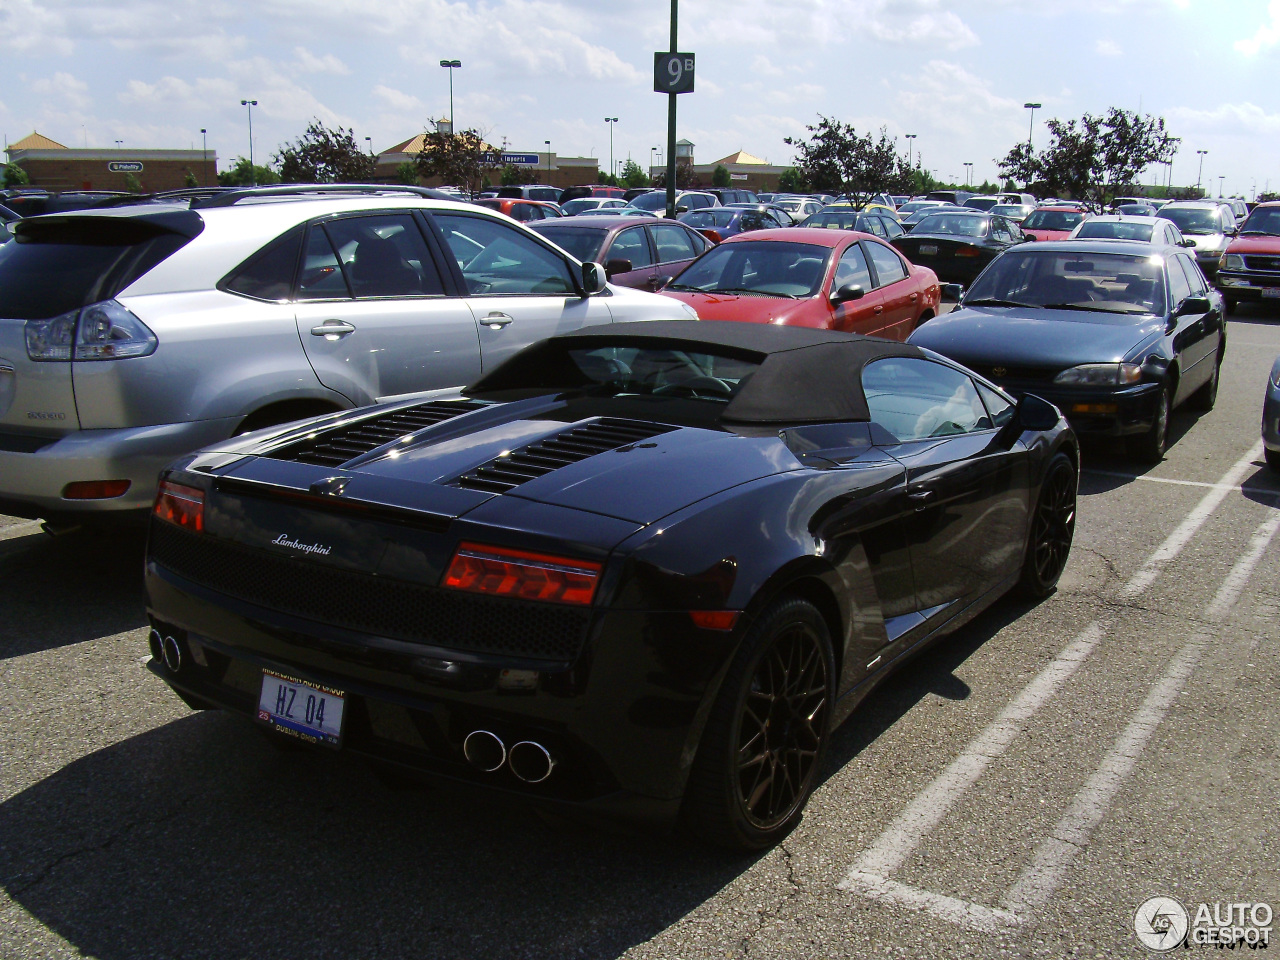 2 i lamborghini gallardo lp560 4 spyder 2 - Lamborghini Gallardo Spyder Black 2013